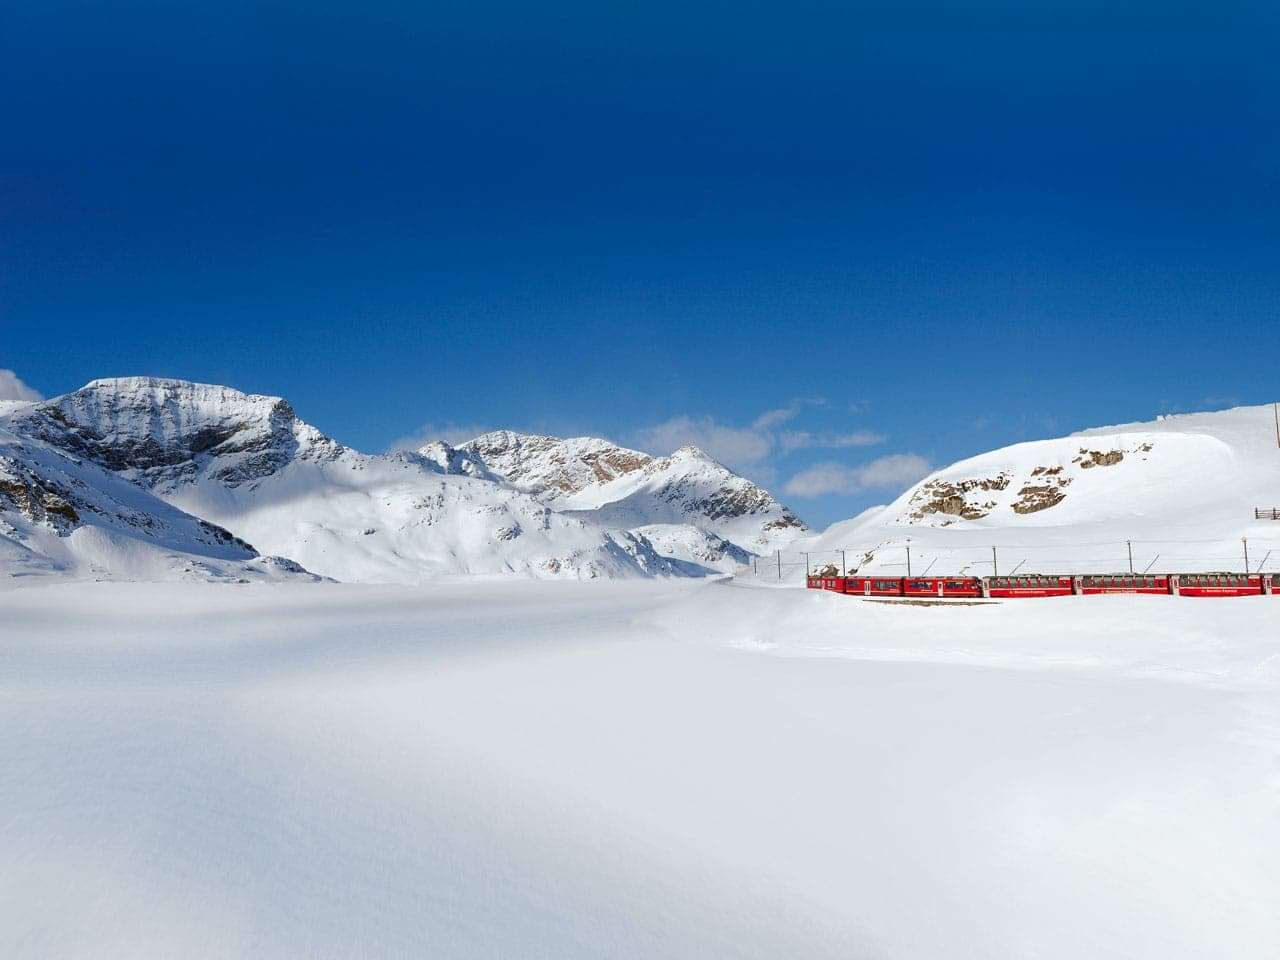 Ausflug: Bernina Express – Alpenüberquerung das ganze Jahr